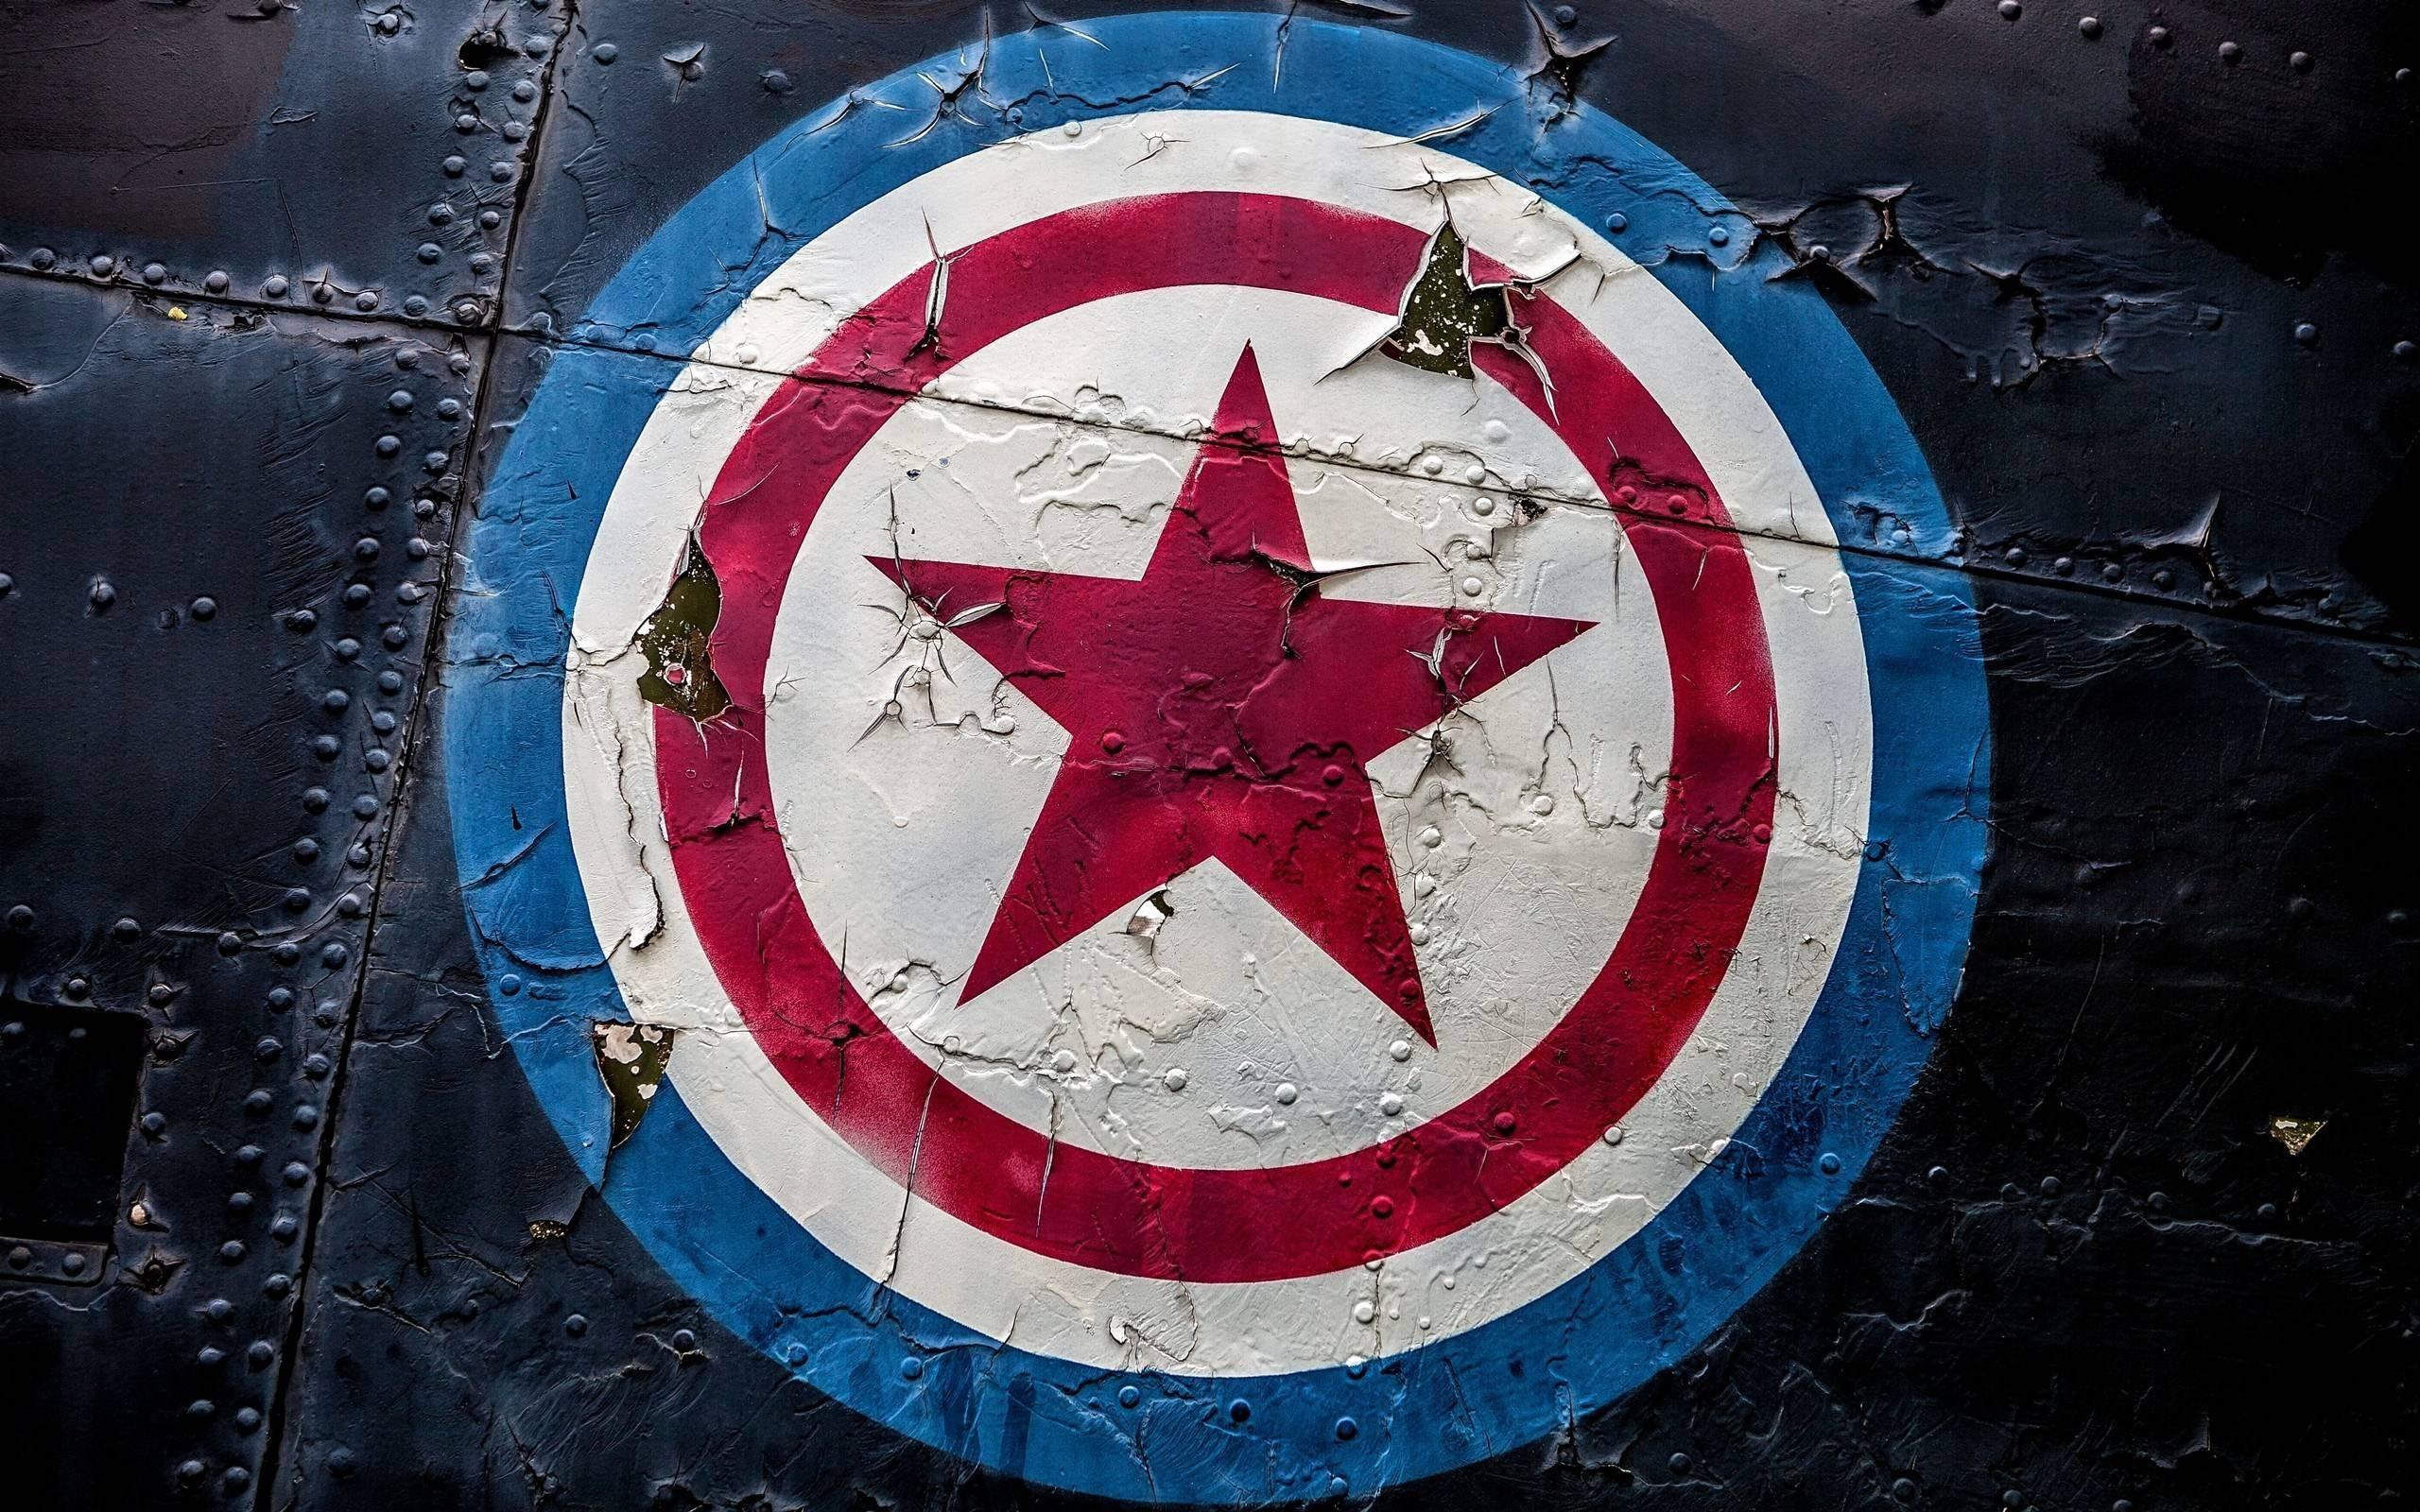 General 2560x1600 metal symbols stars Captain America Marvel Cinematic Universe